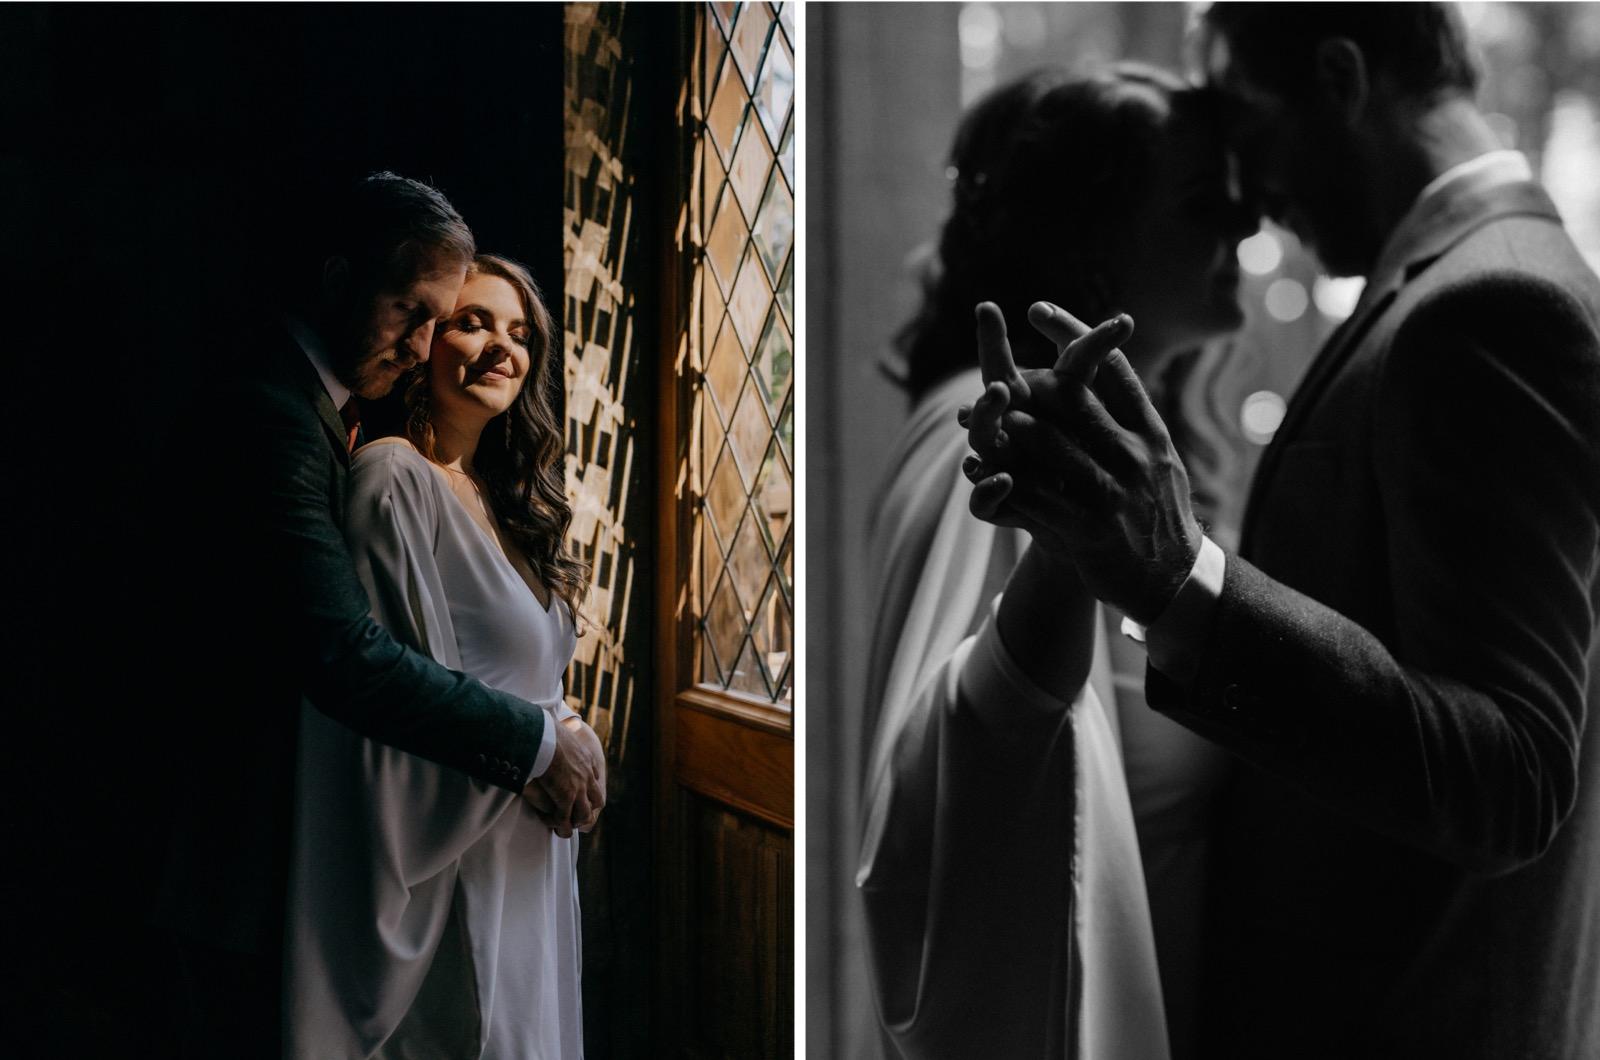 036_Emily & Jeff Wedding 0280_Emily & Jeff Wedding 0287_outdoor_waterfall-lodge_forest_wedding_portrait_intimate